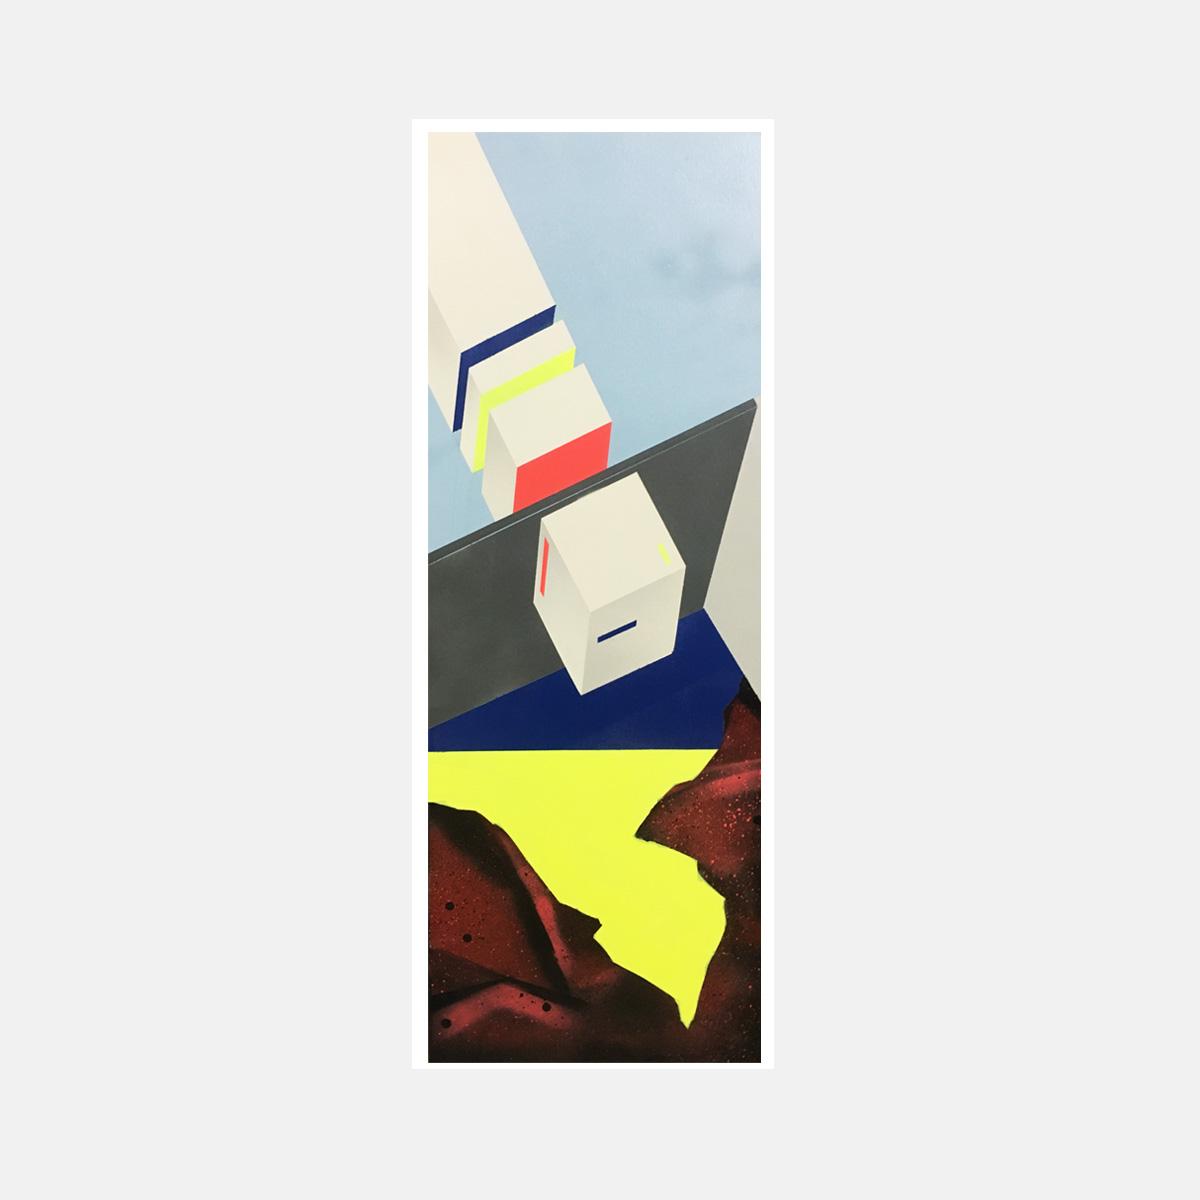 """Going Through"" by Pierrick Senelaer"